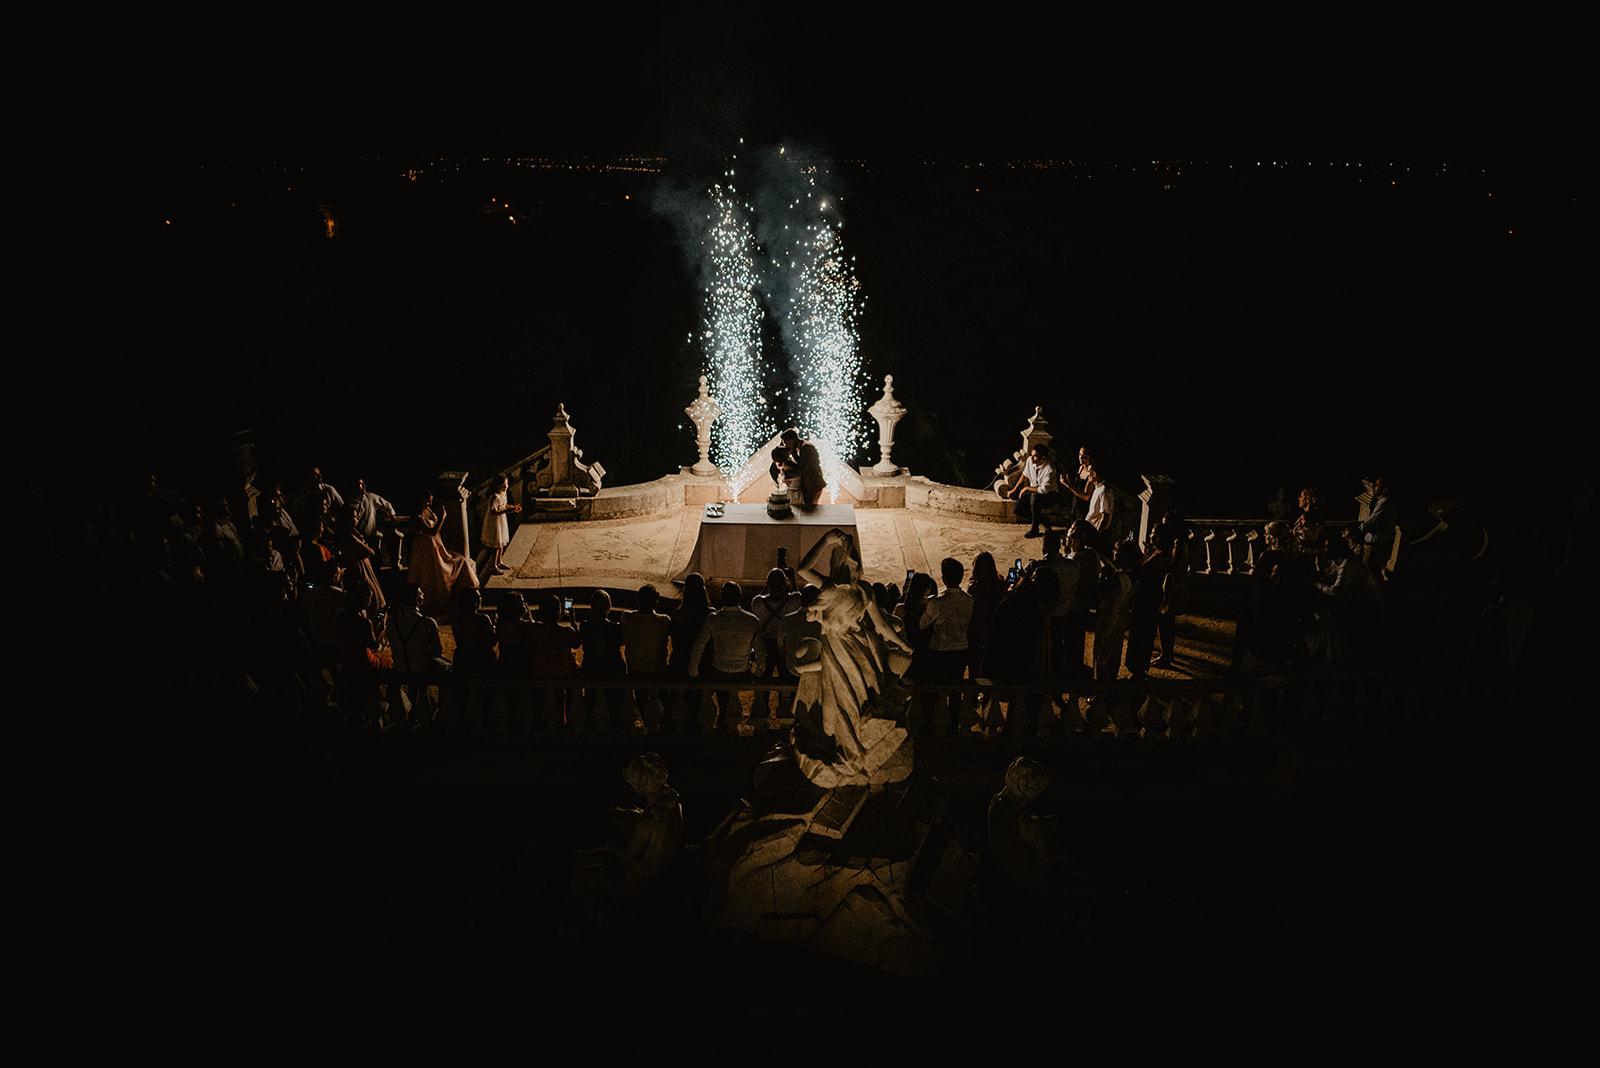 Lapela-photography-wedding-algarve-portugal-best-of-4.jpg